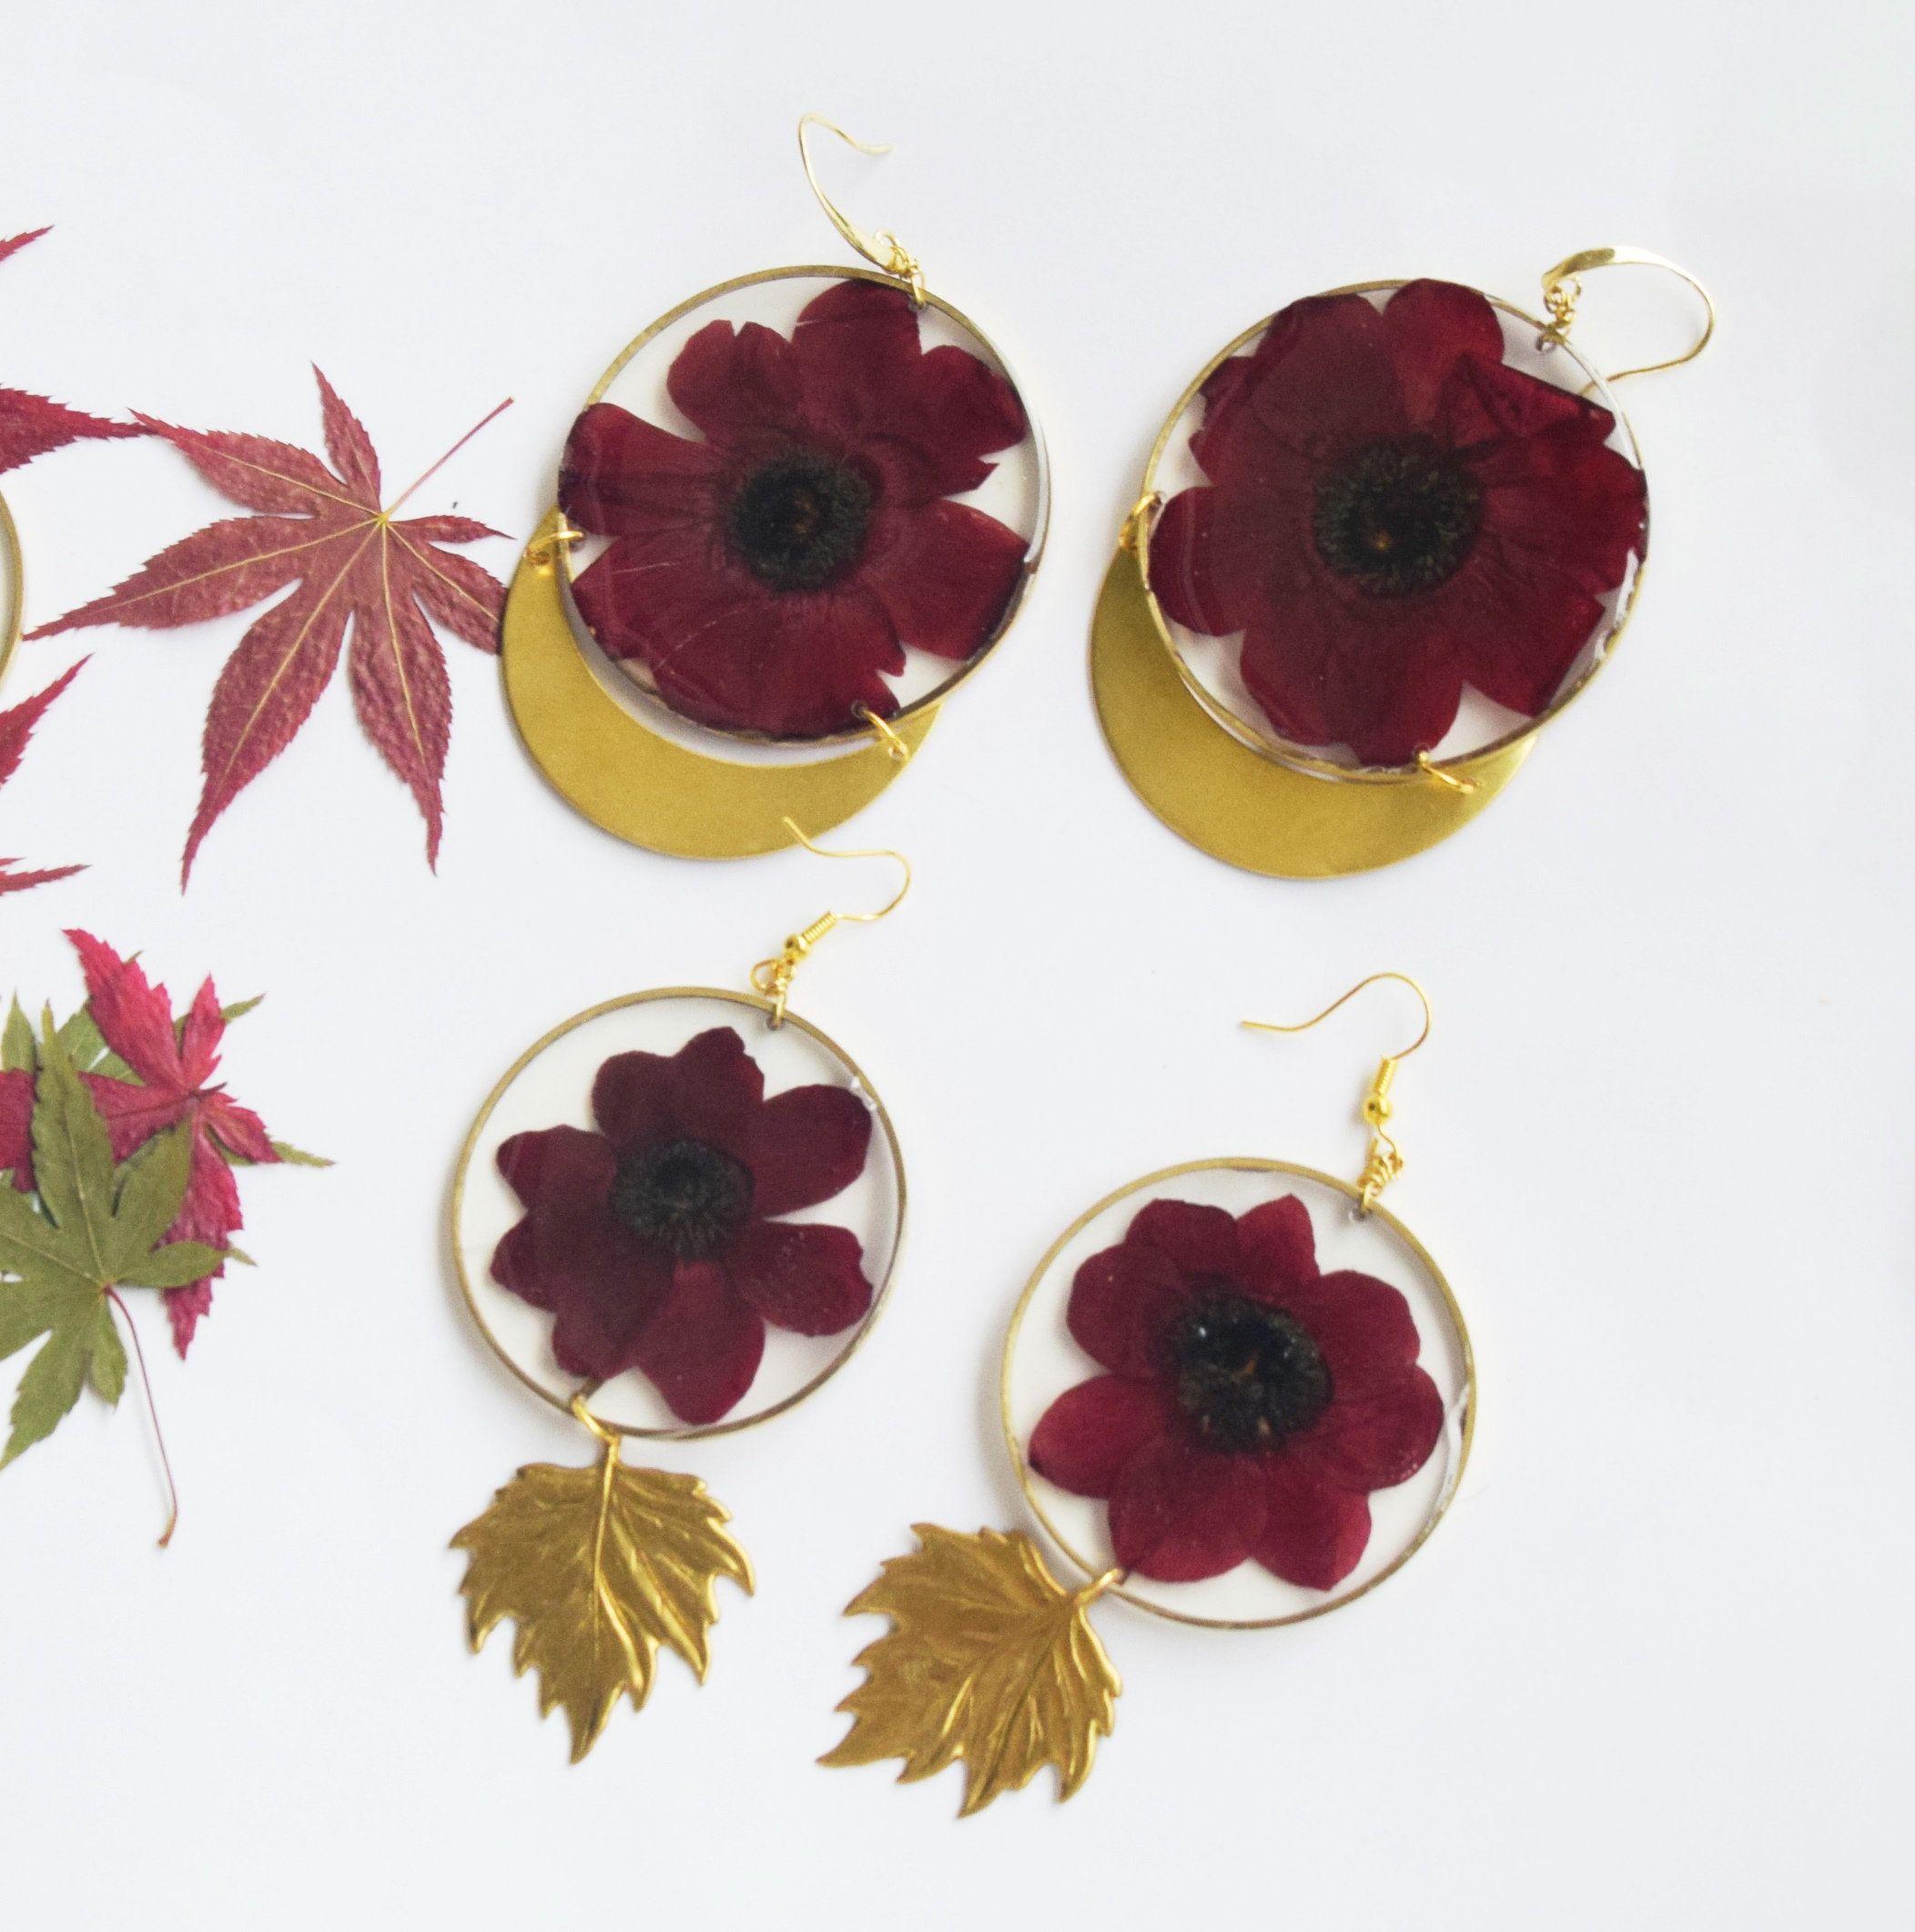 Anemone Flower Earrings Preserved Flower Brass Leaf Eco Etsy In 2020 Flower Earrings Eco Resin How To Preserve Flowers